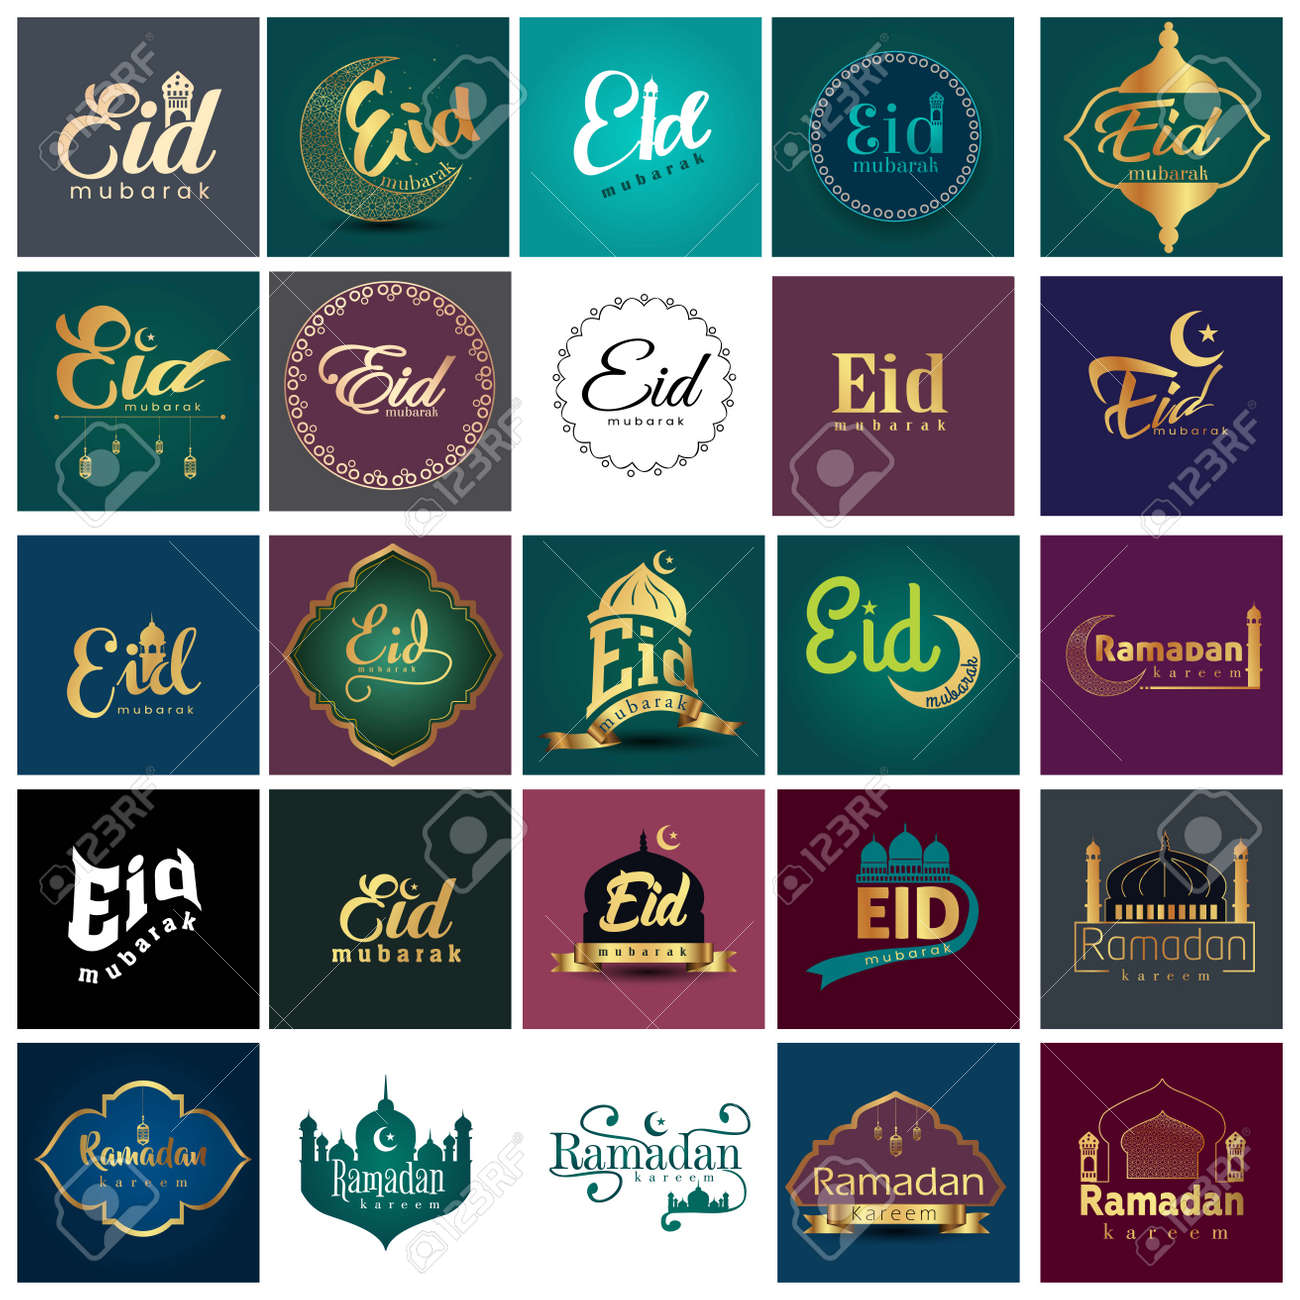 eid mubark and ramadan kareem logo set. vector illustration design - 165718052